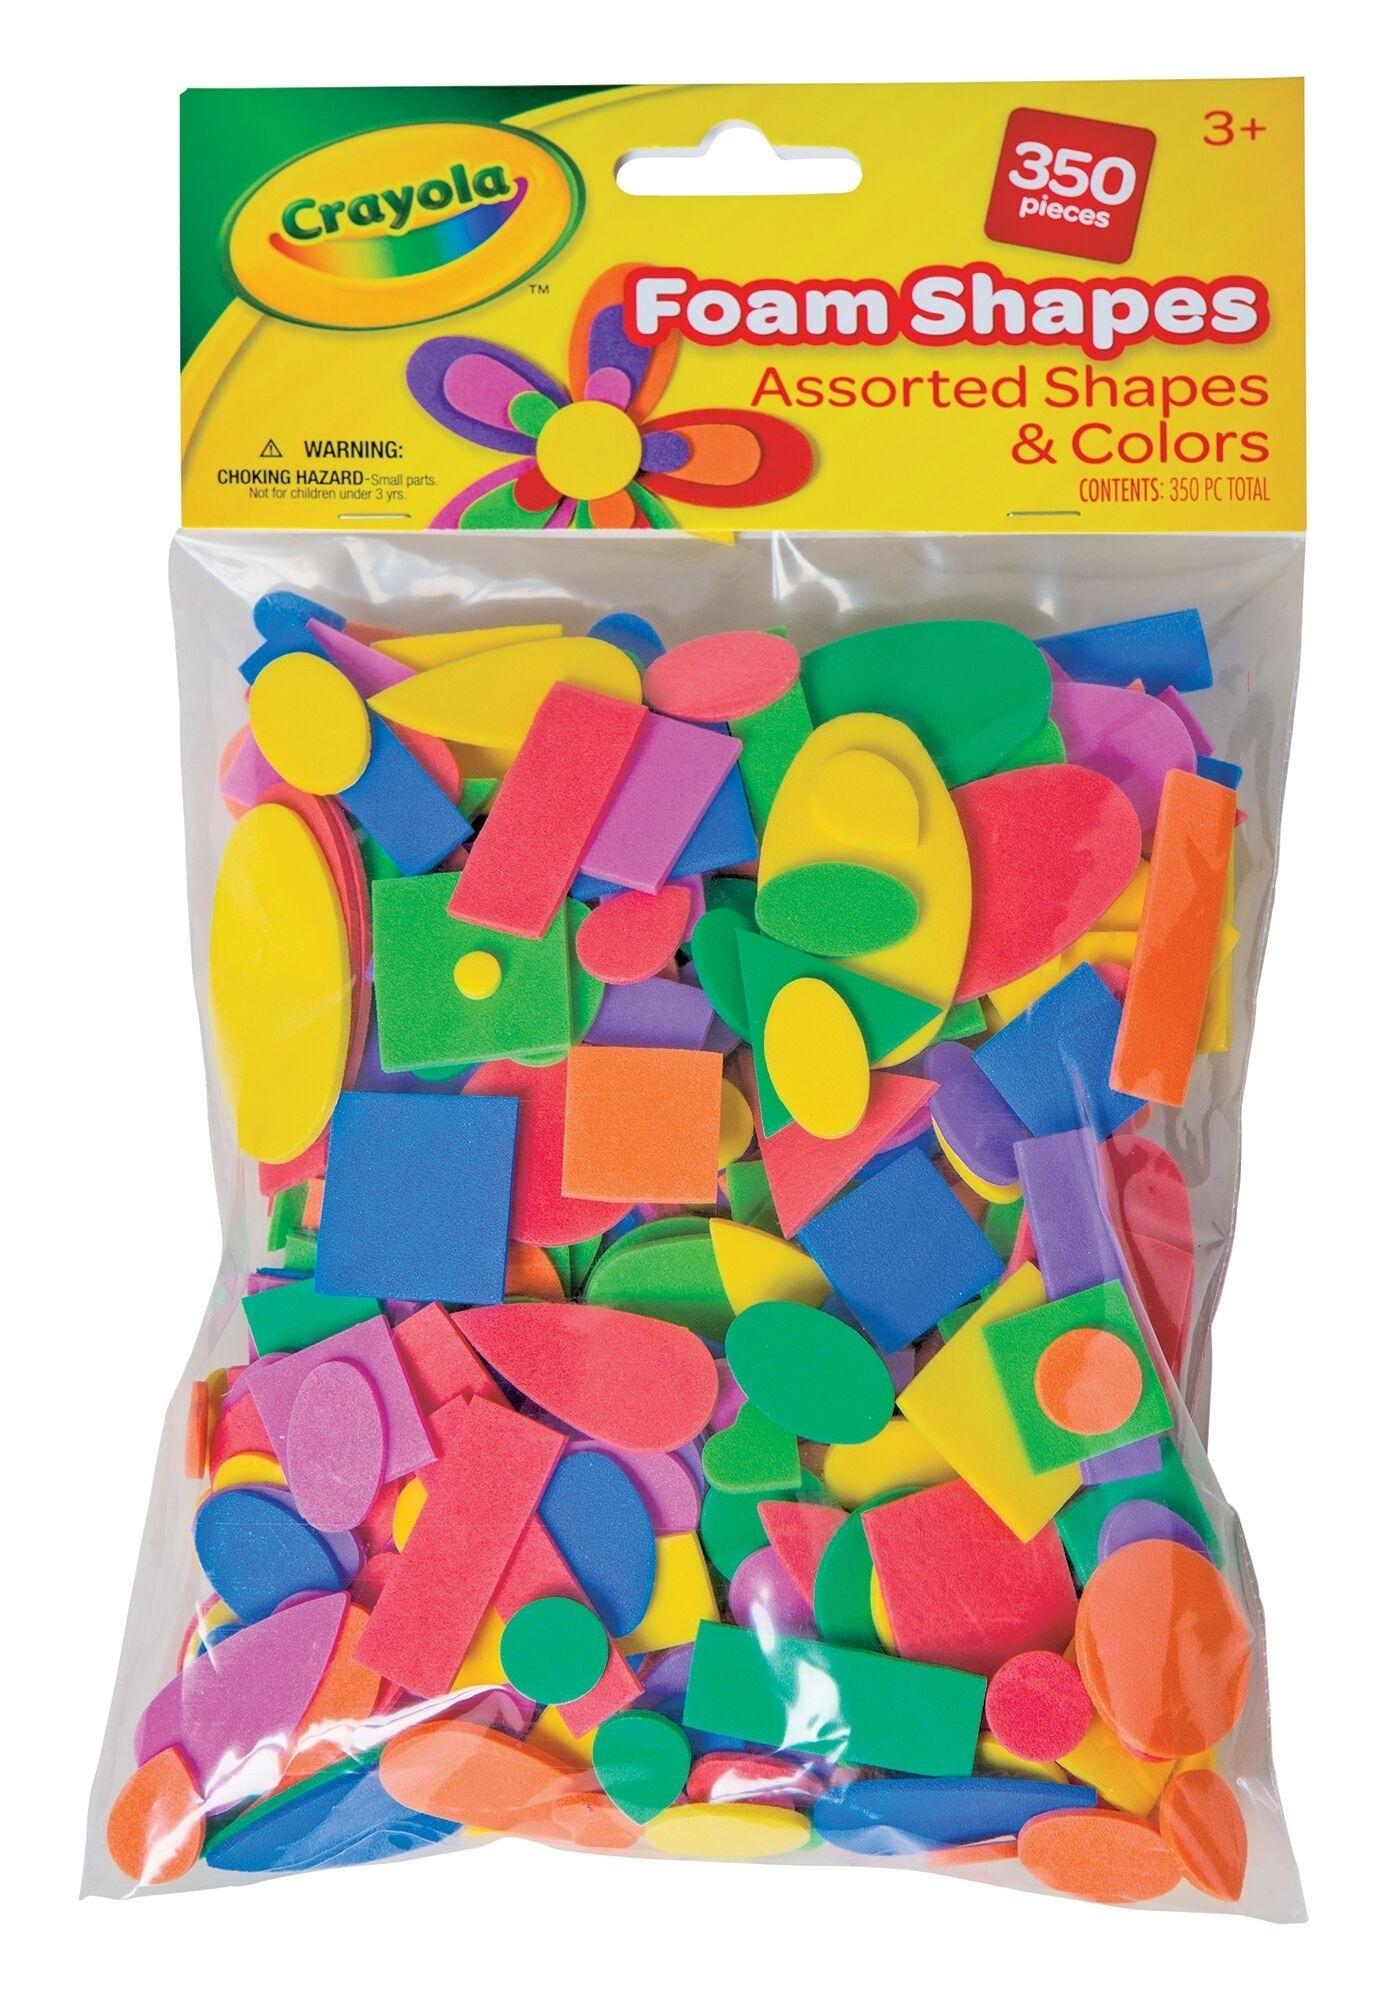 Crayola Craft - Foam Shapes - 350 pcs